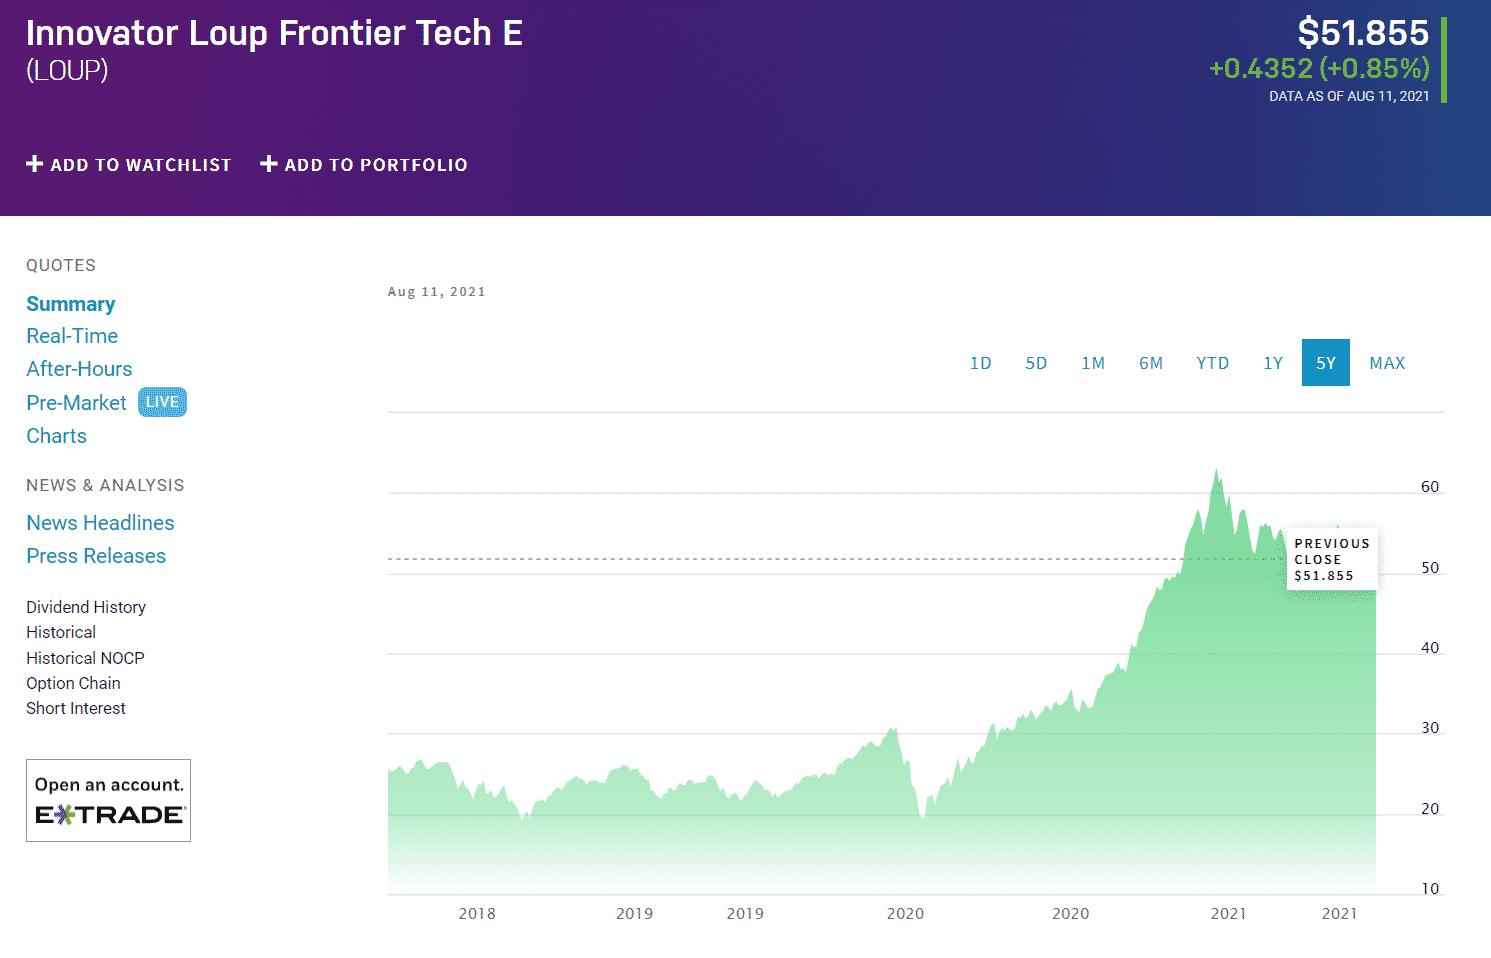 Innovator Loup Frontier Tech ETF LOUP chart